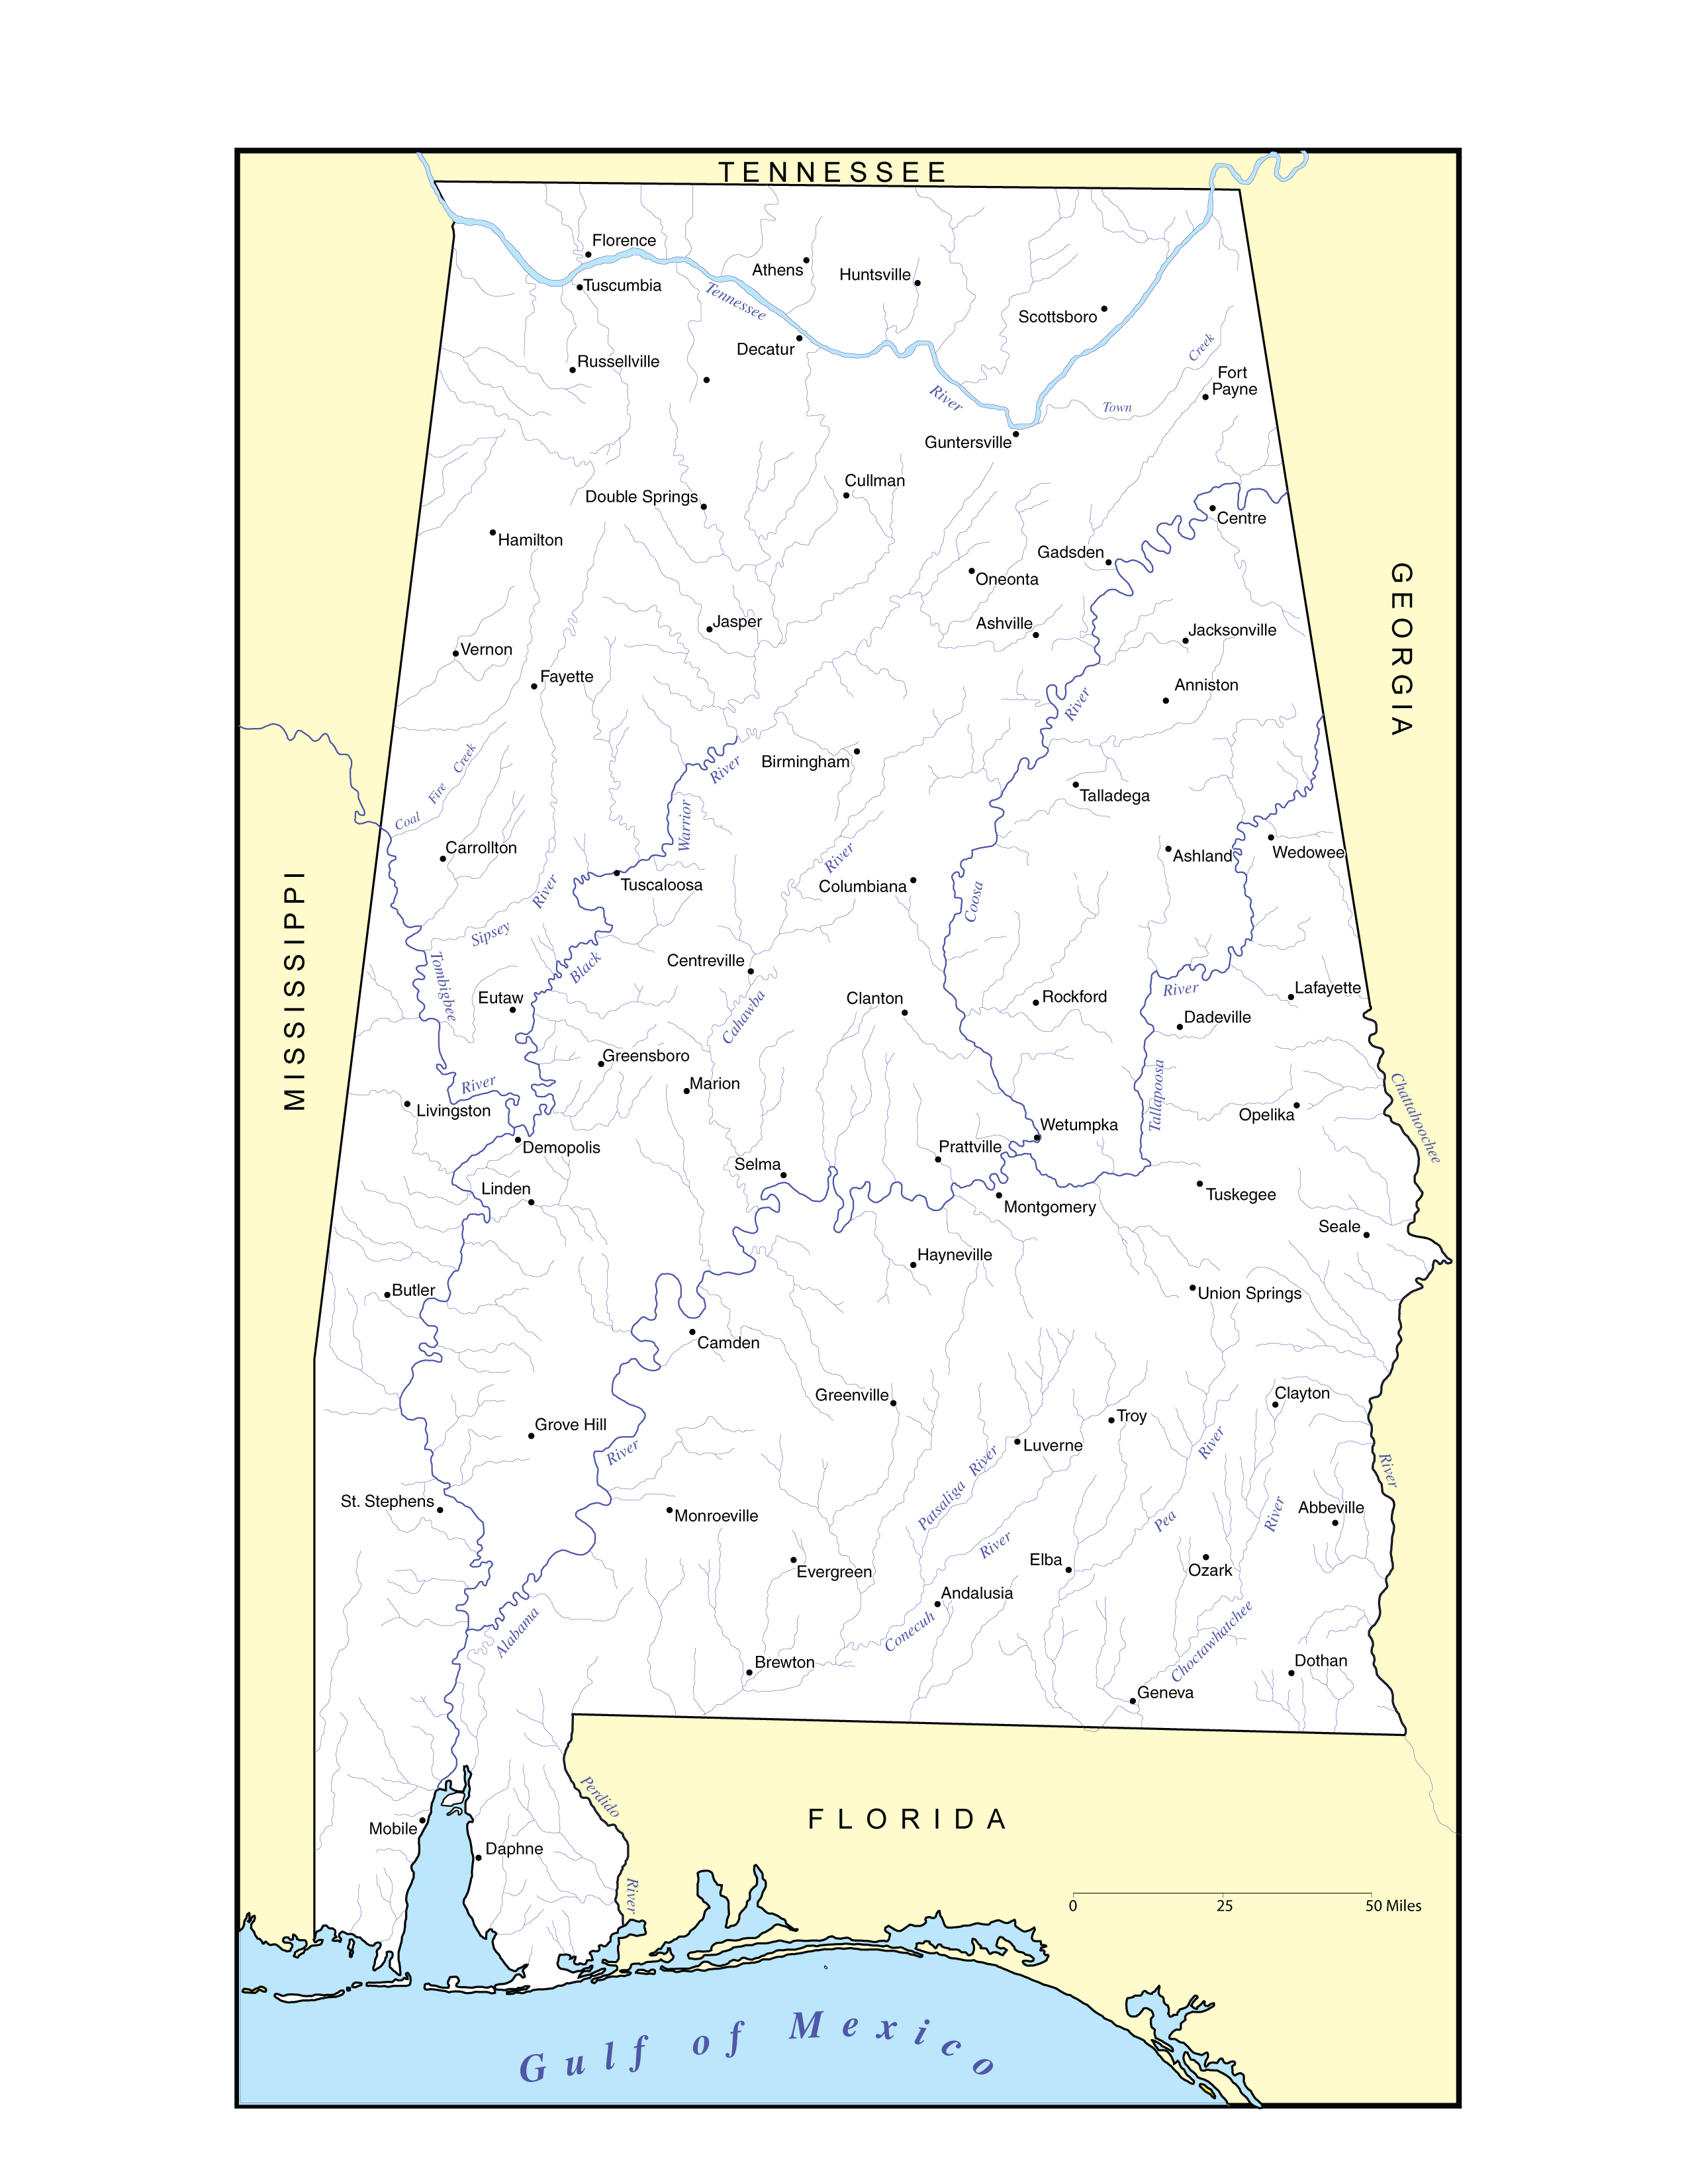 Alabama Outline Maps And Map Links